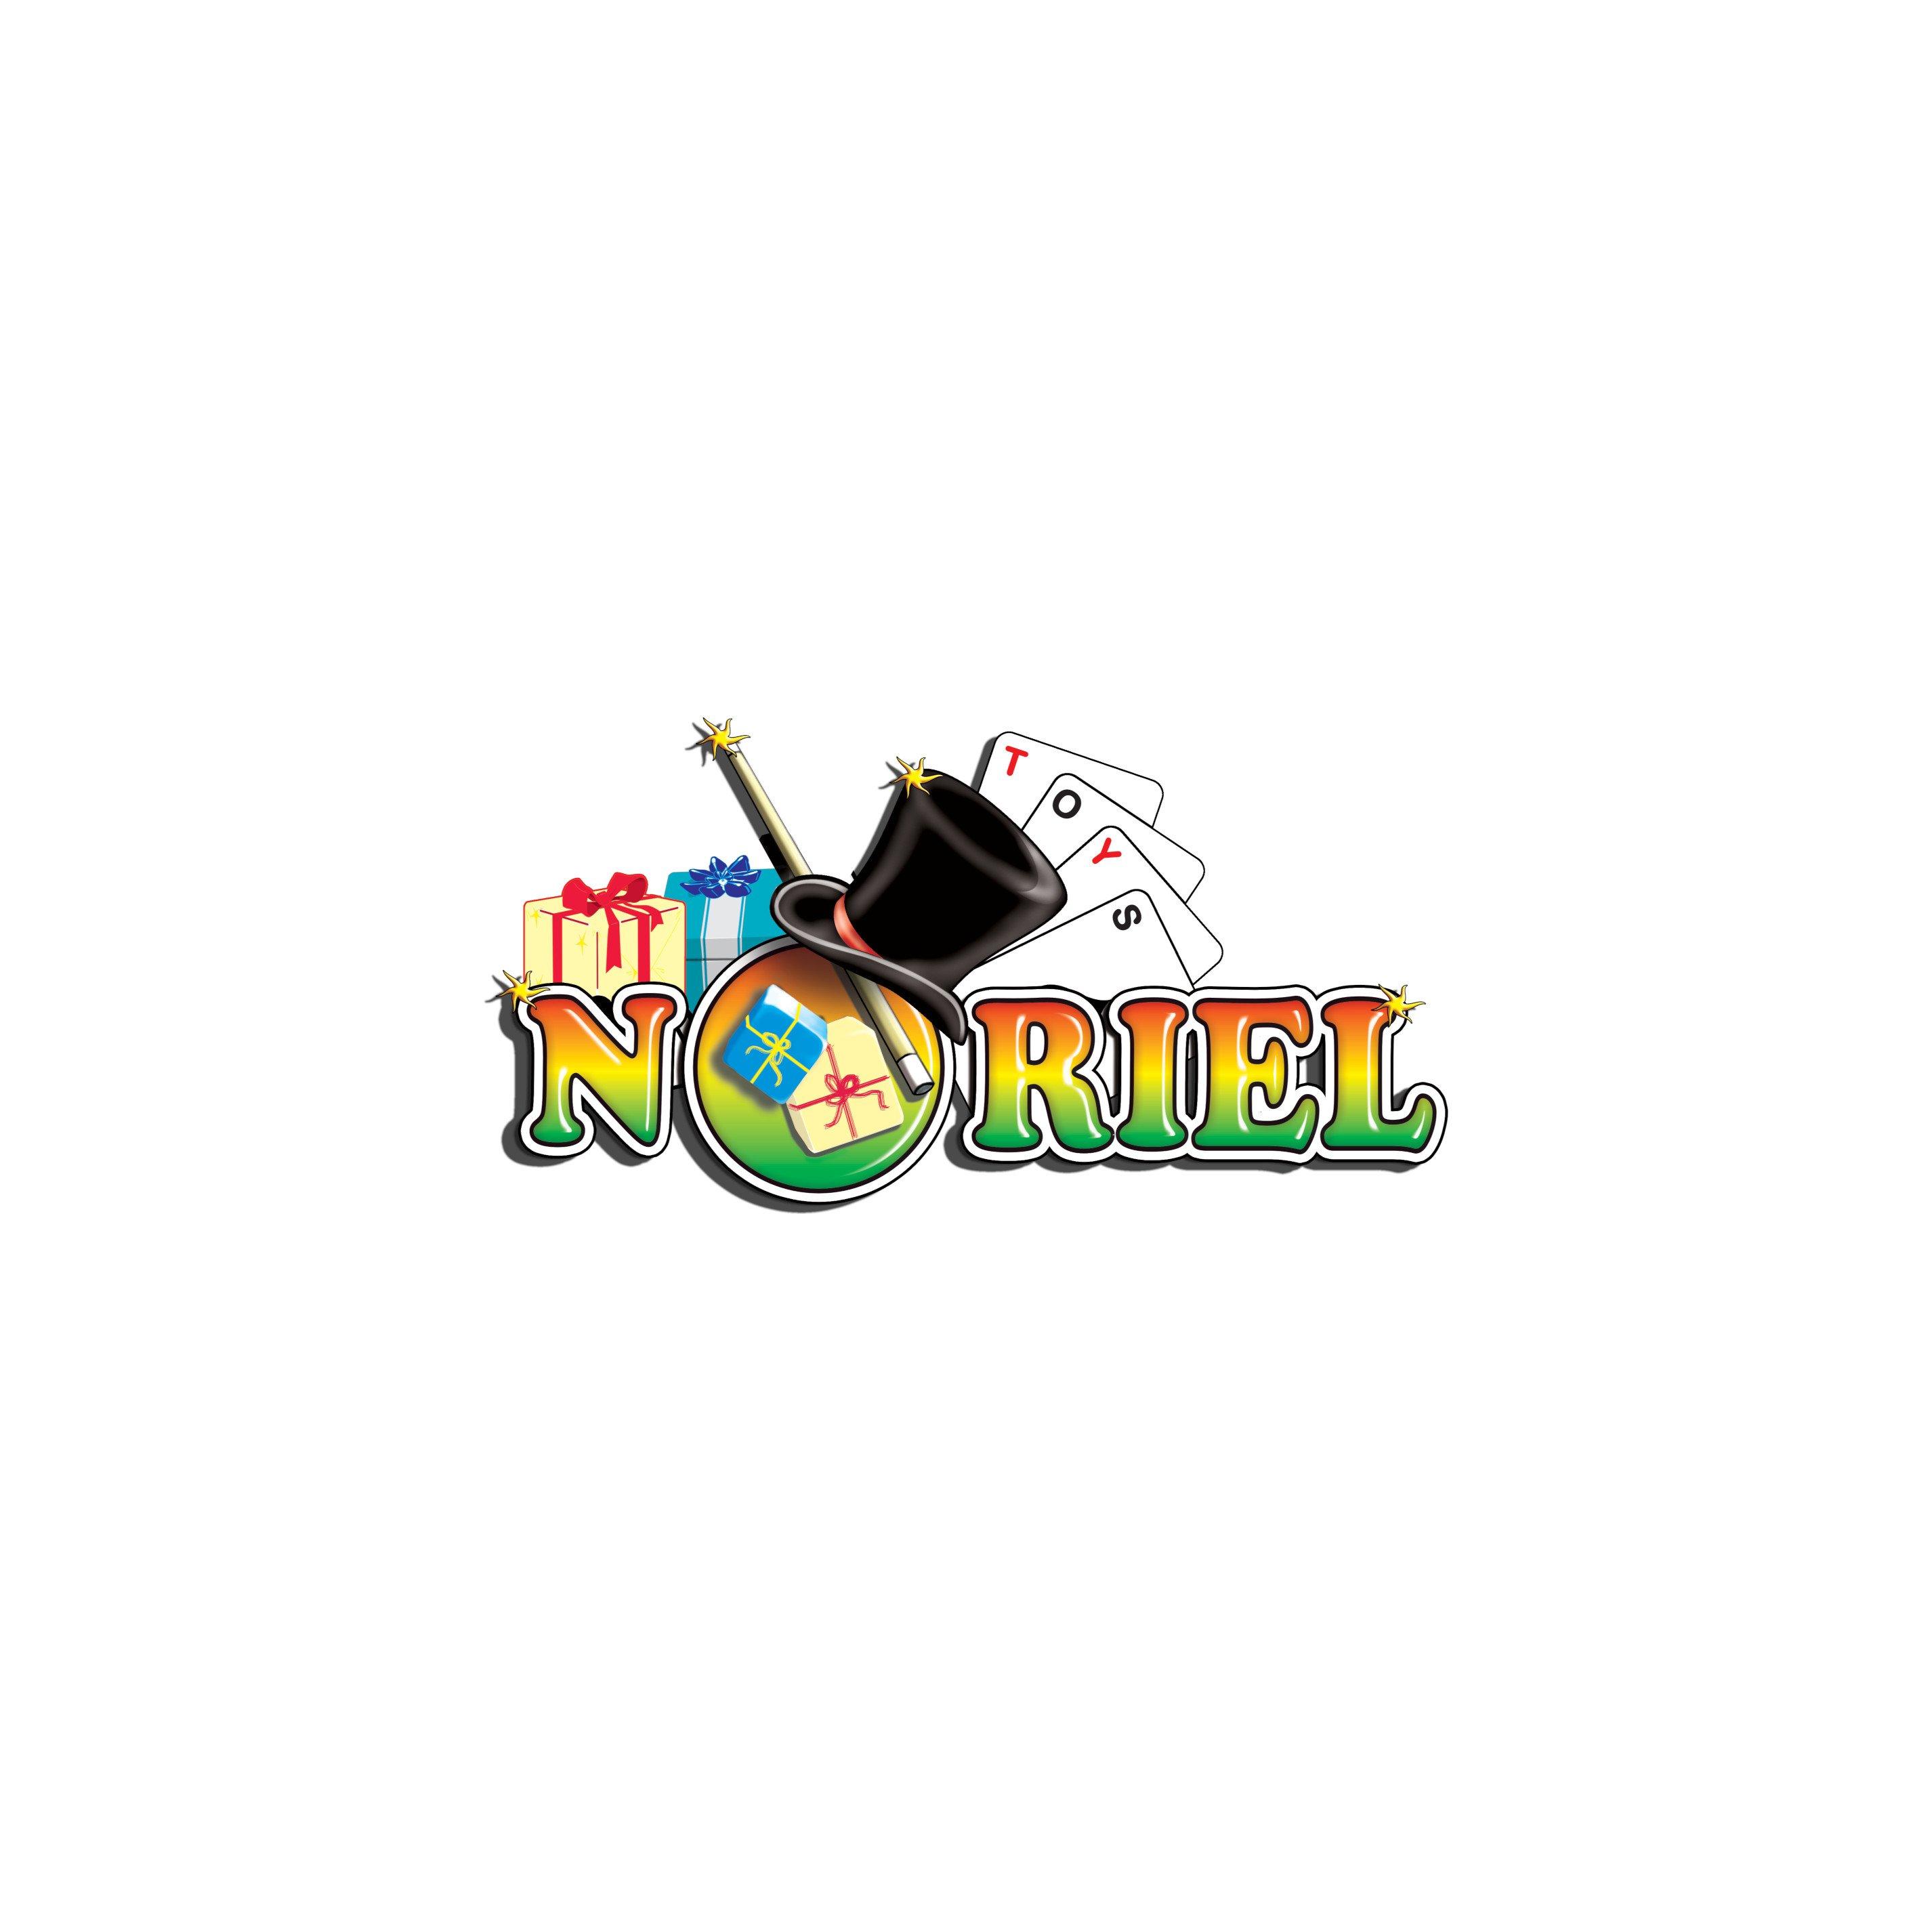 Tricou copii Joystar Colectia Tropical 1I2213